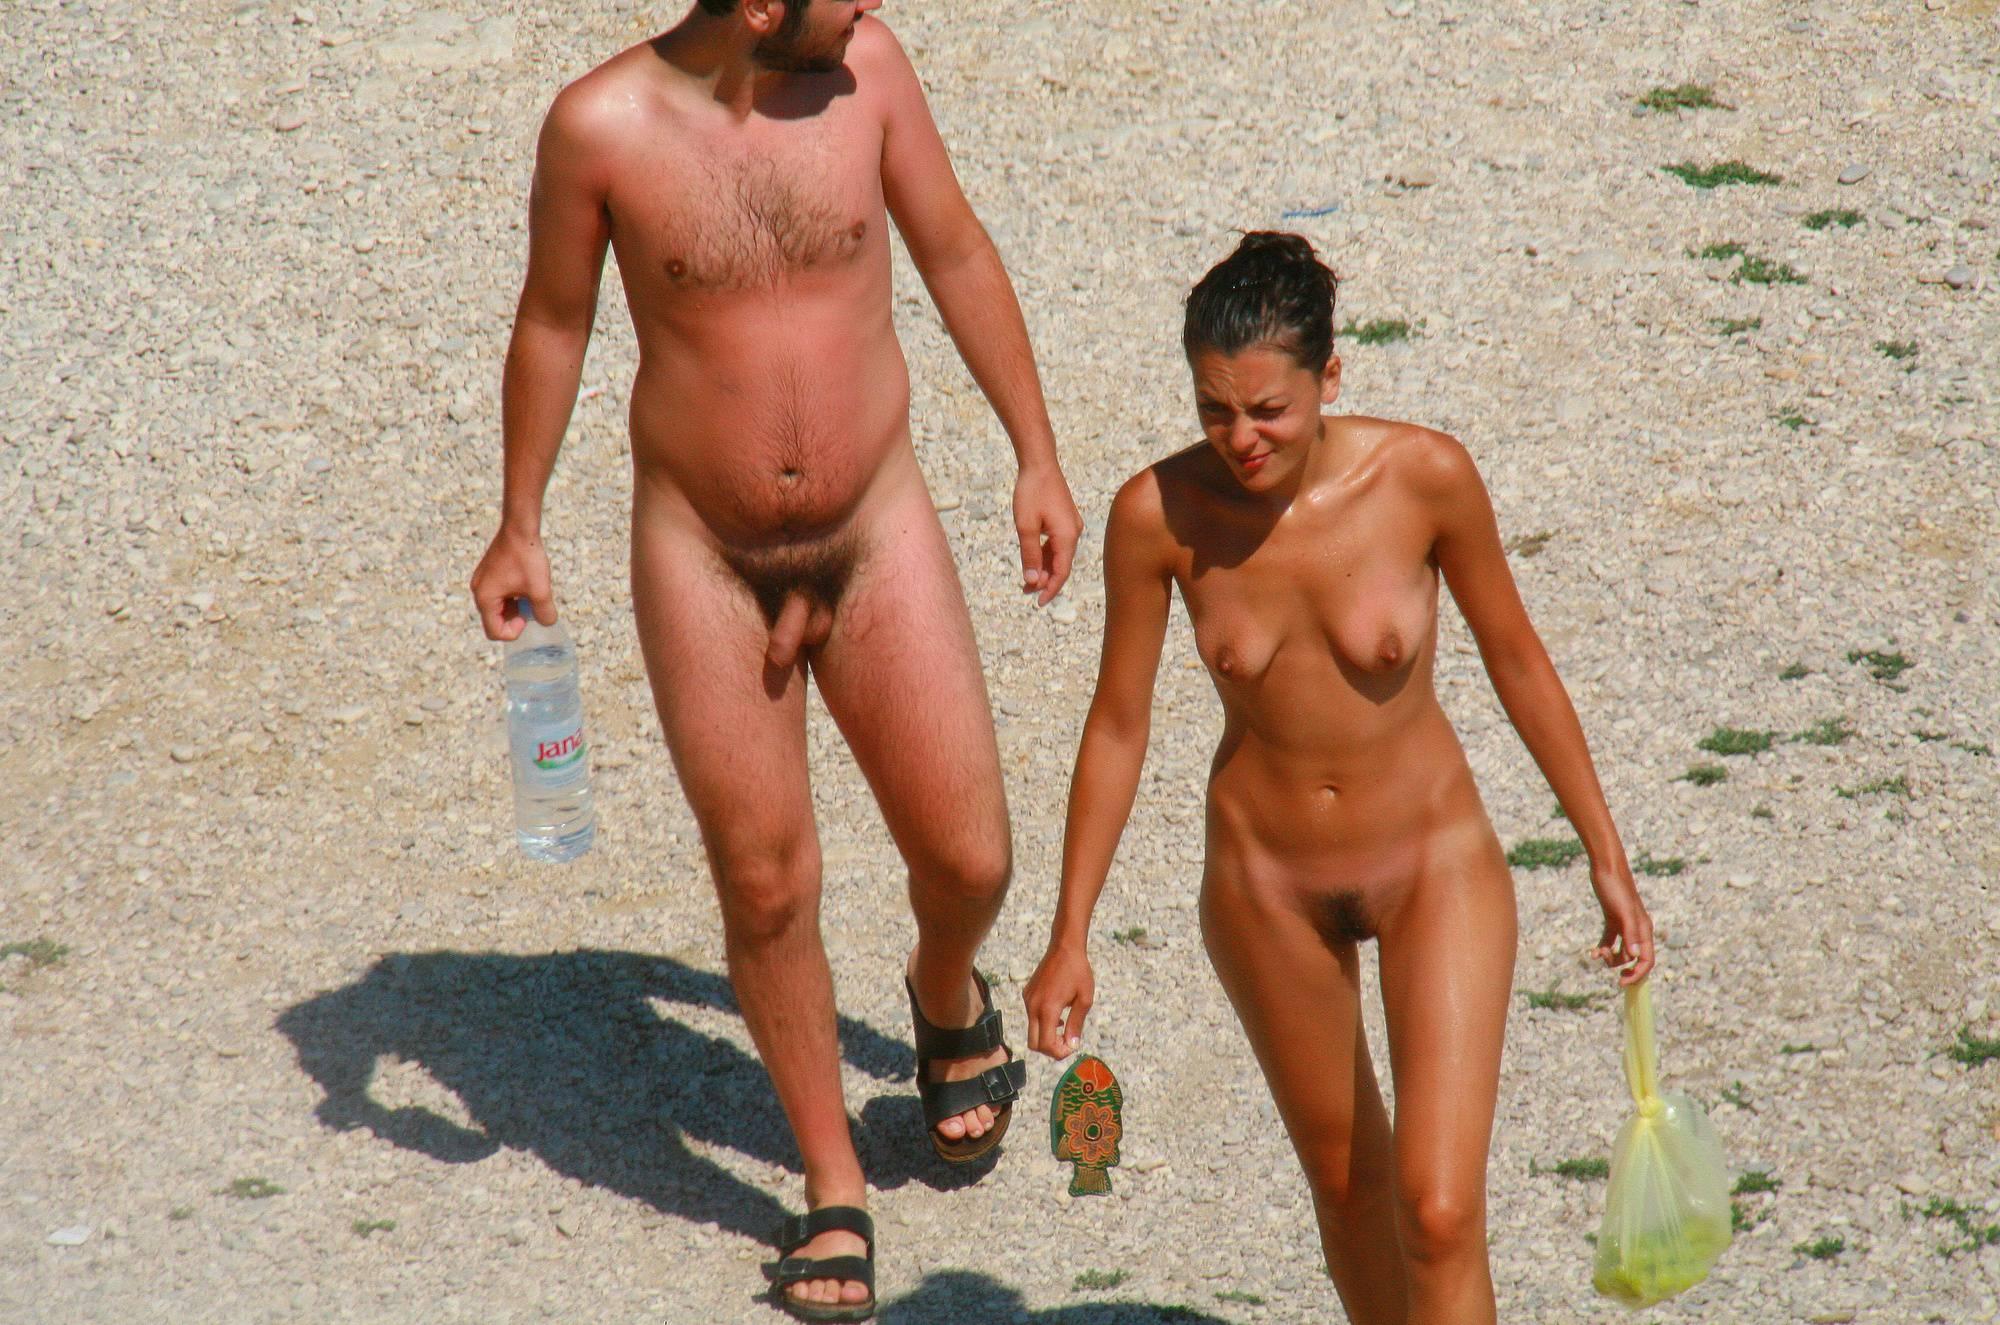 Nudist Photos Ula FKK Dating Couples Day - 1